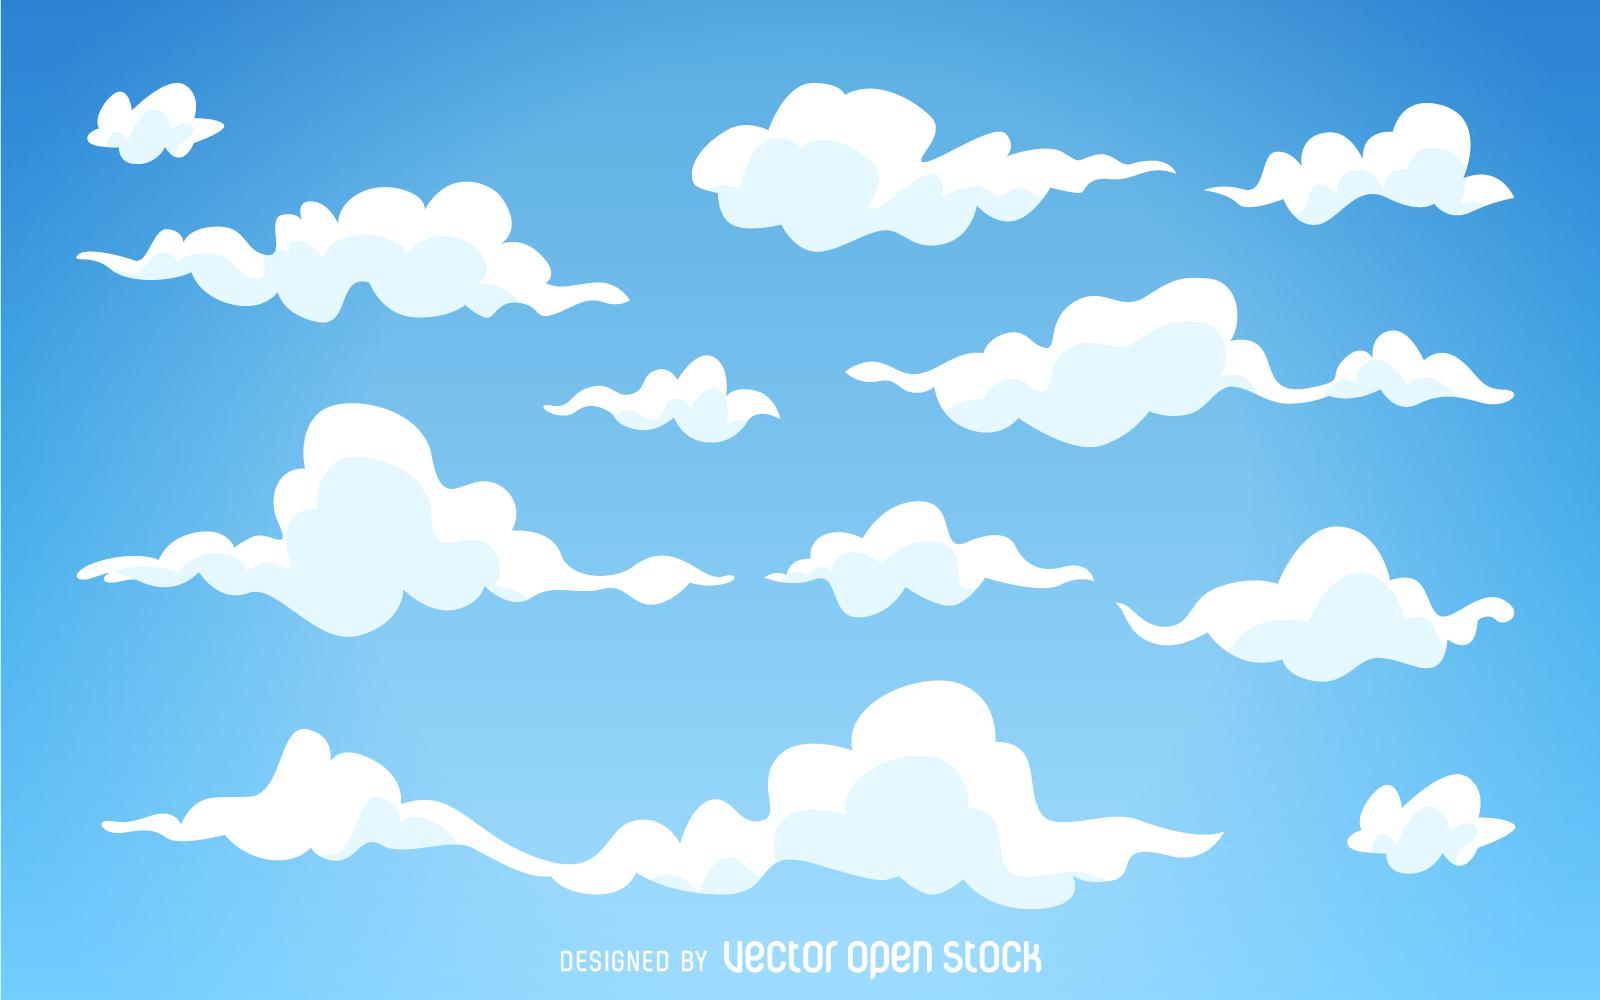 Cartoon Cloud Png | Free download best Cartoon Cloud Png on